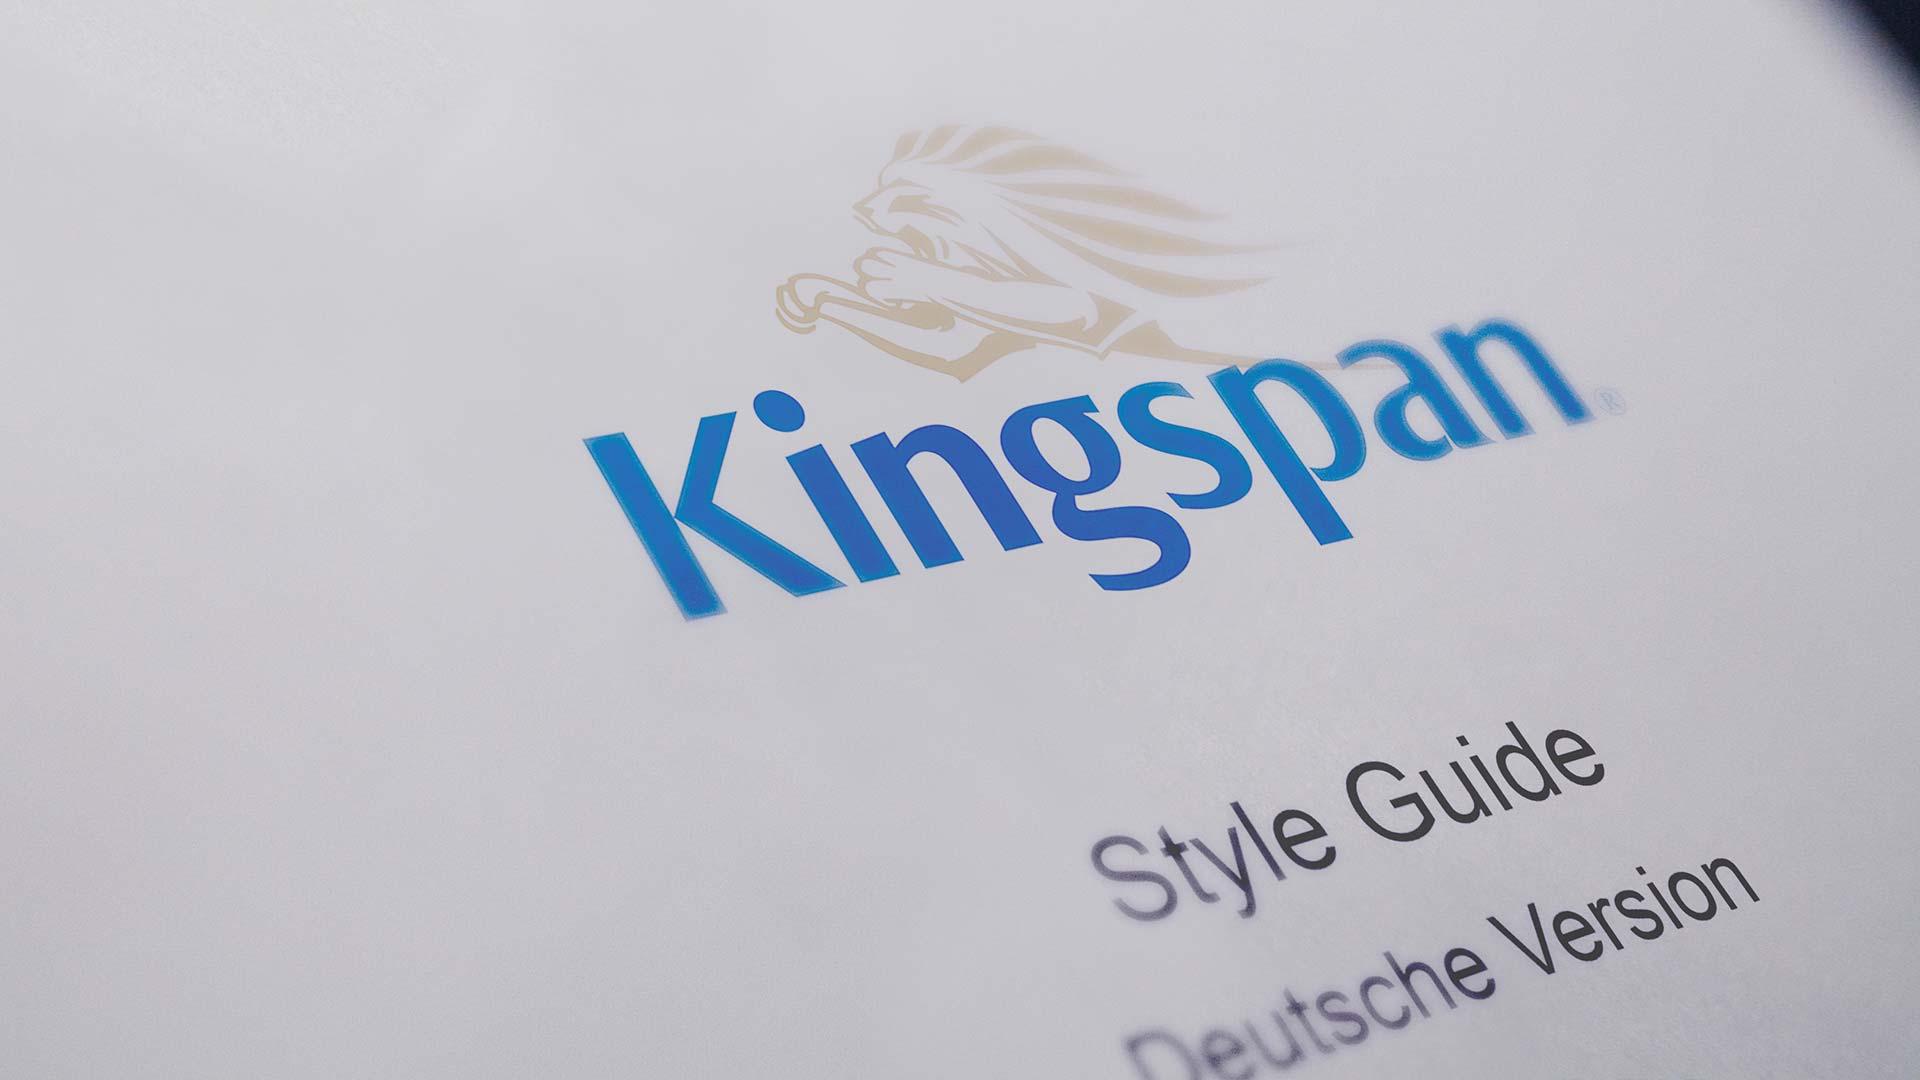 PSV Referenz: Kingspan Styleguide